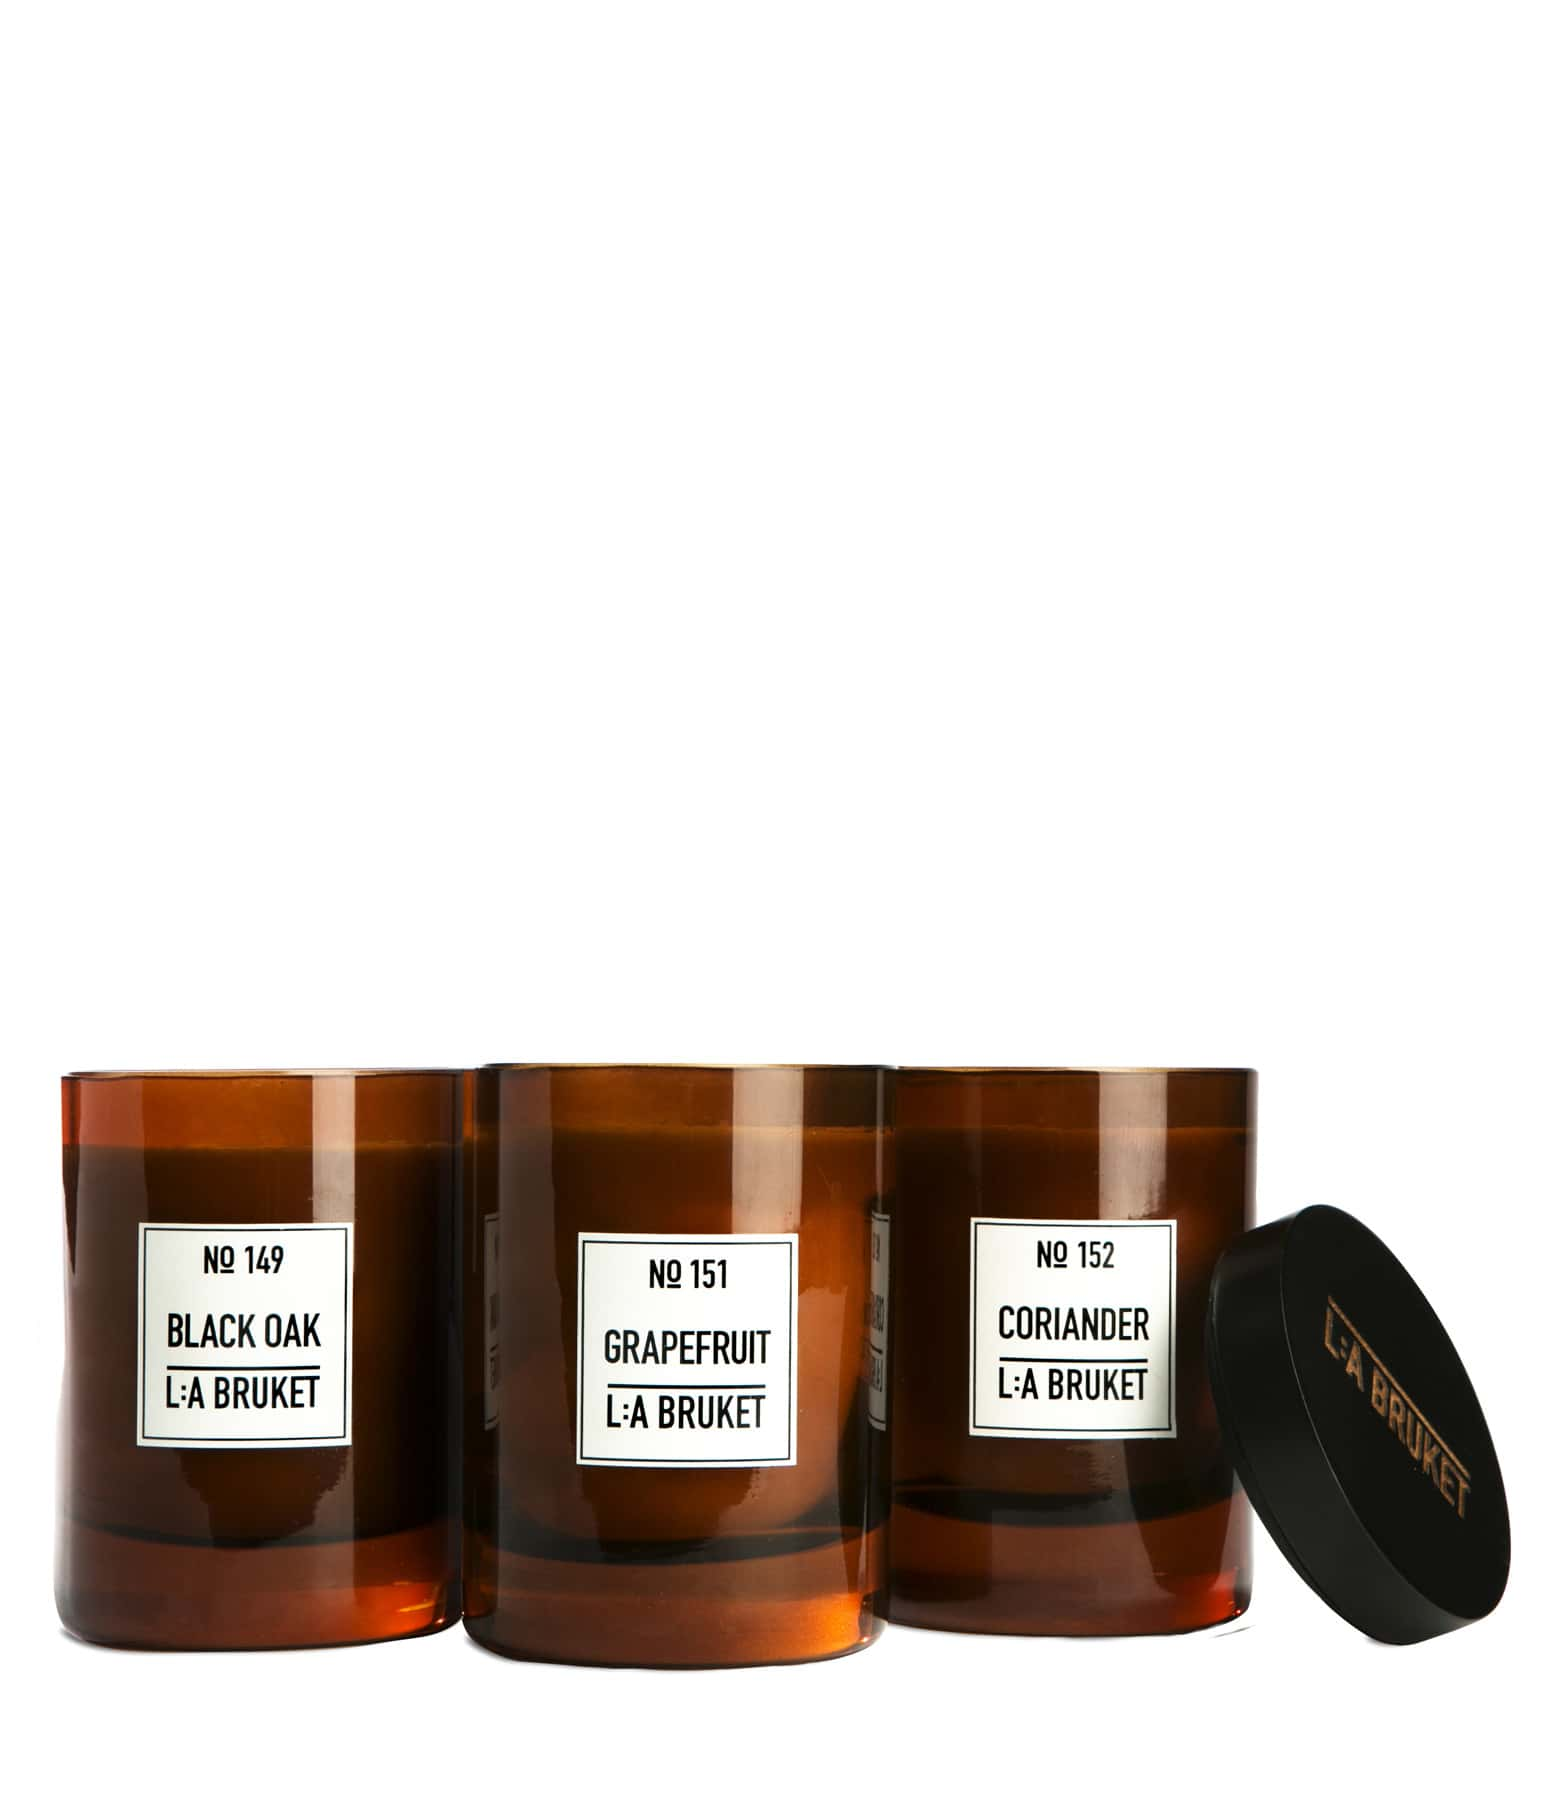 L:A BRUKET - Bougie Parfumée Coriandre 260g N°152